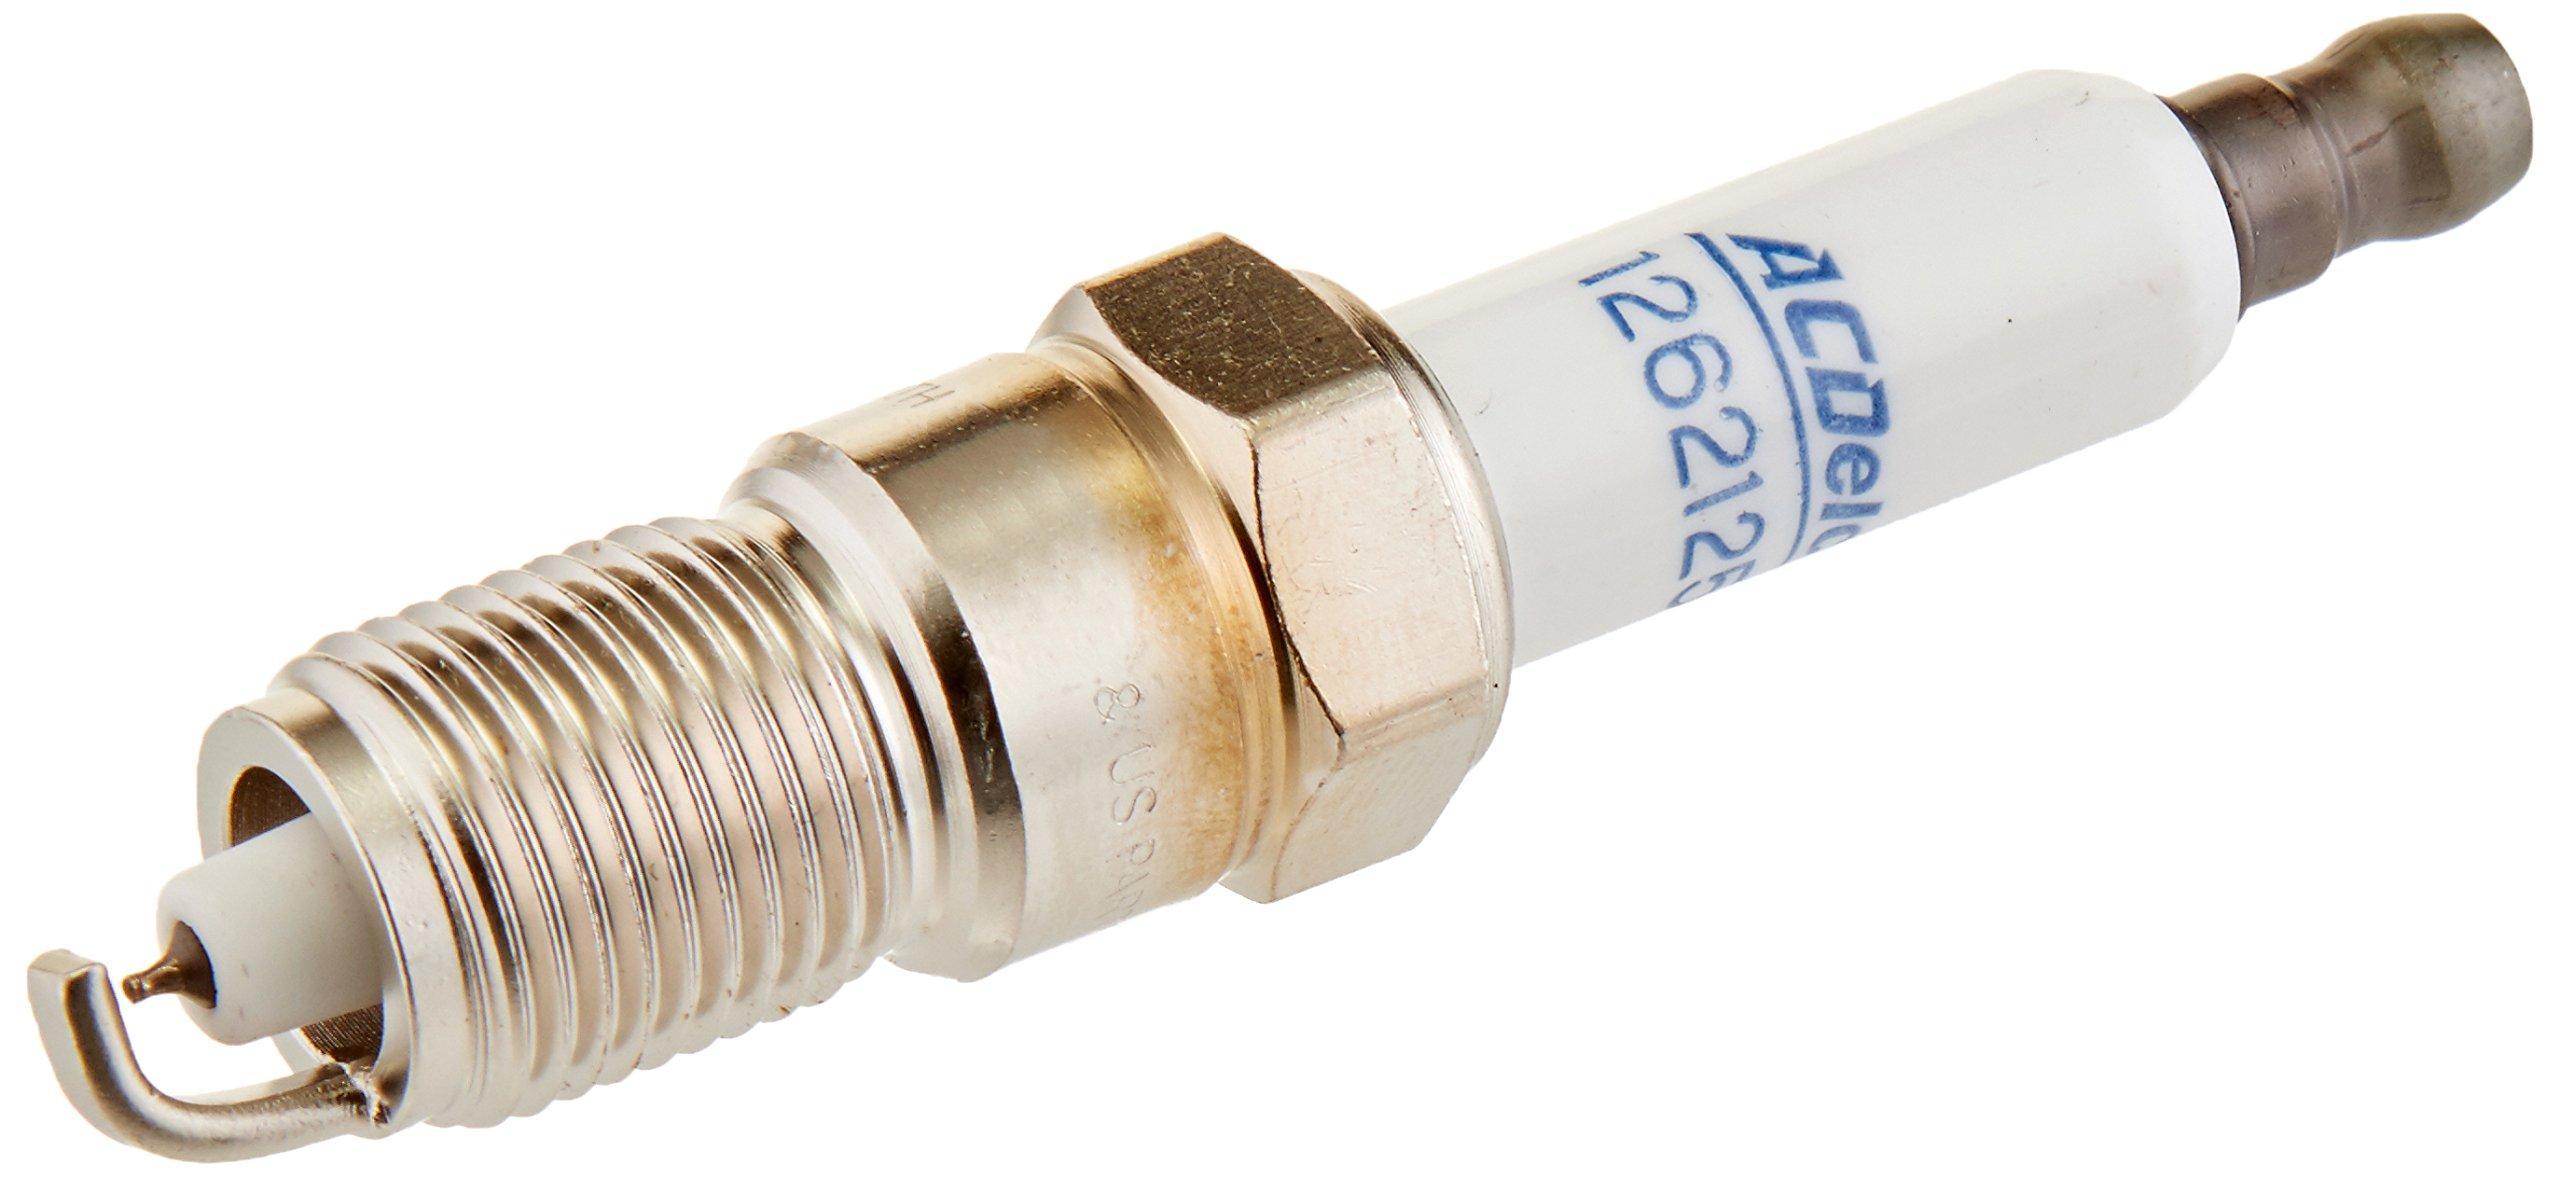 ACDelco 41-110 Professional Iridium Spark Plug --- 8 Pcs * NEW *